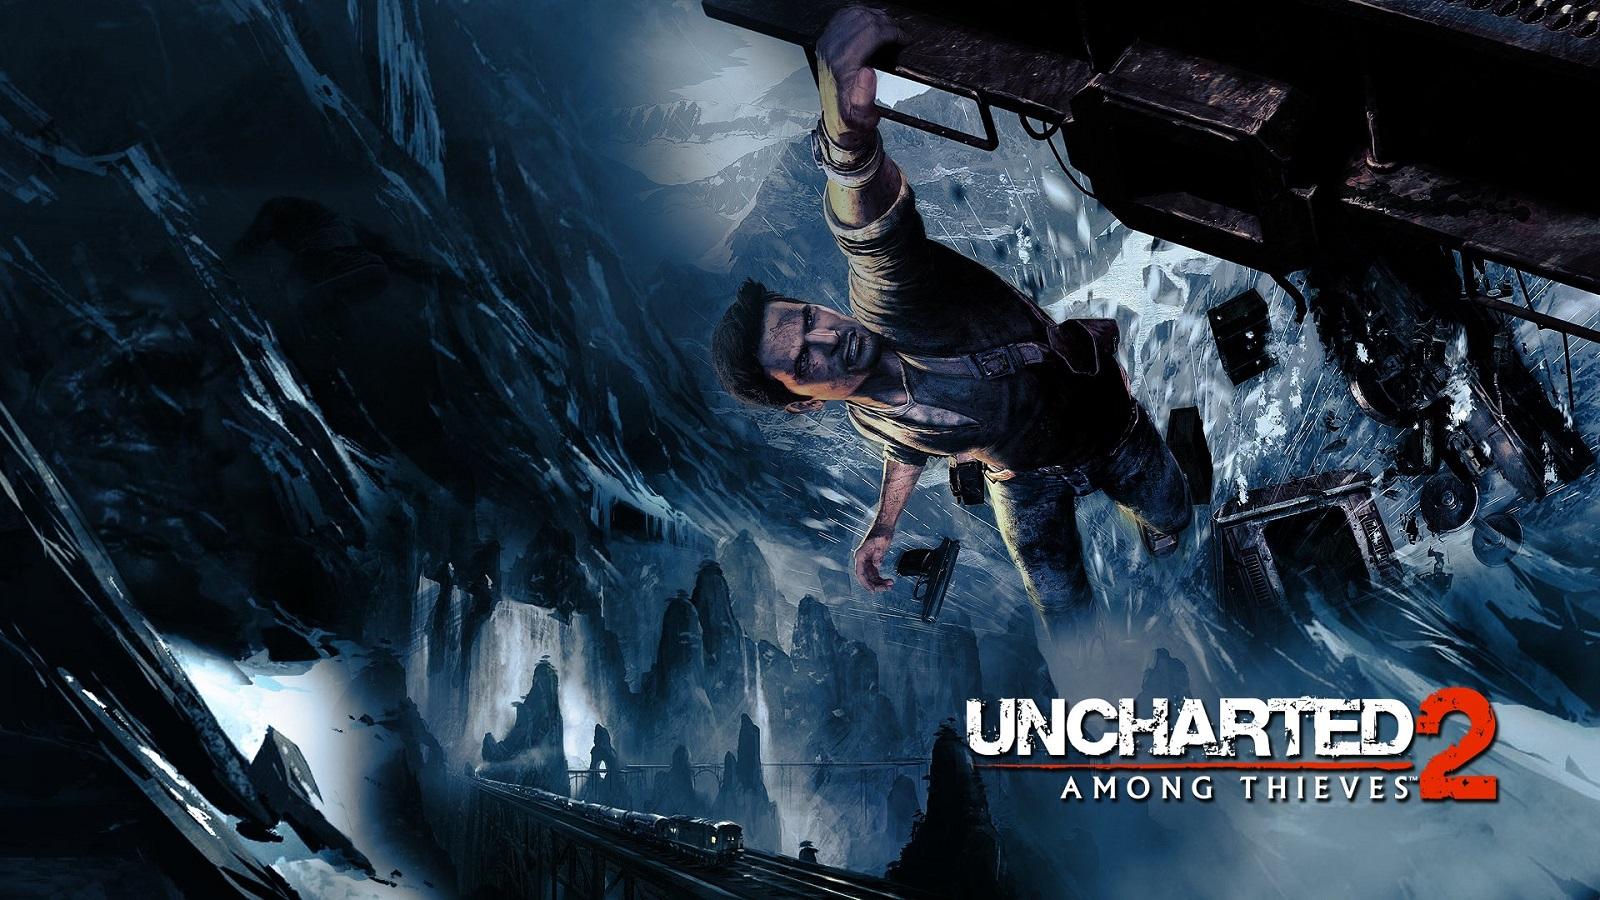 uncharted 3 uncharted 2 nathan drake